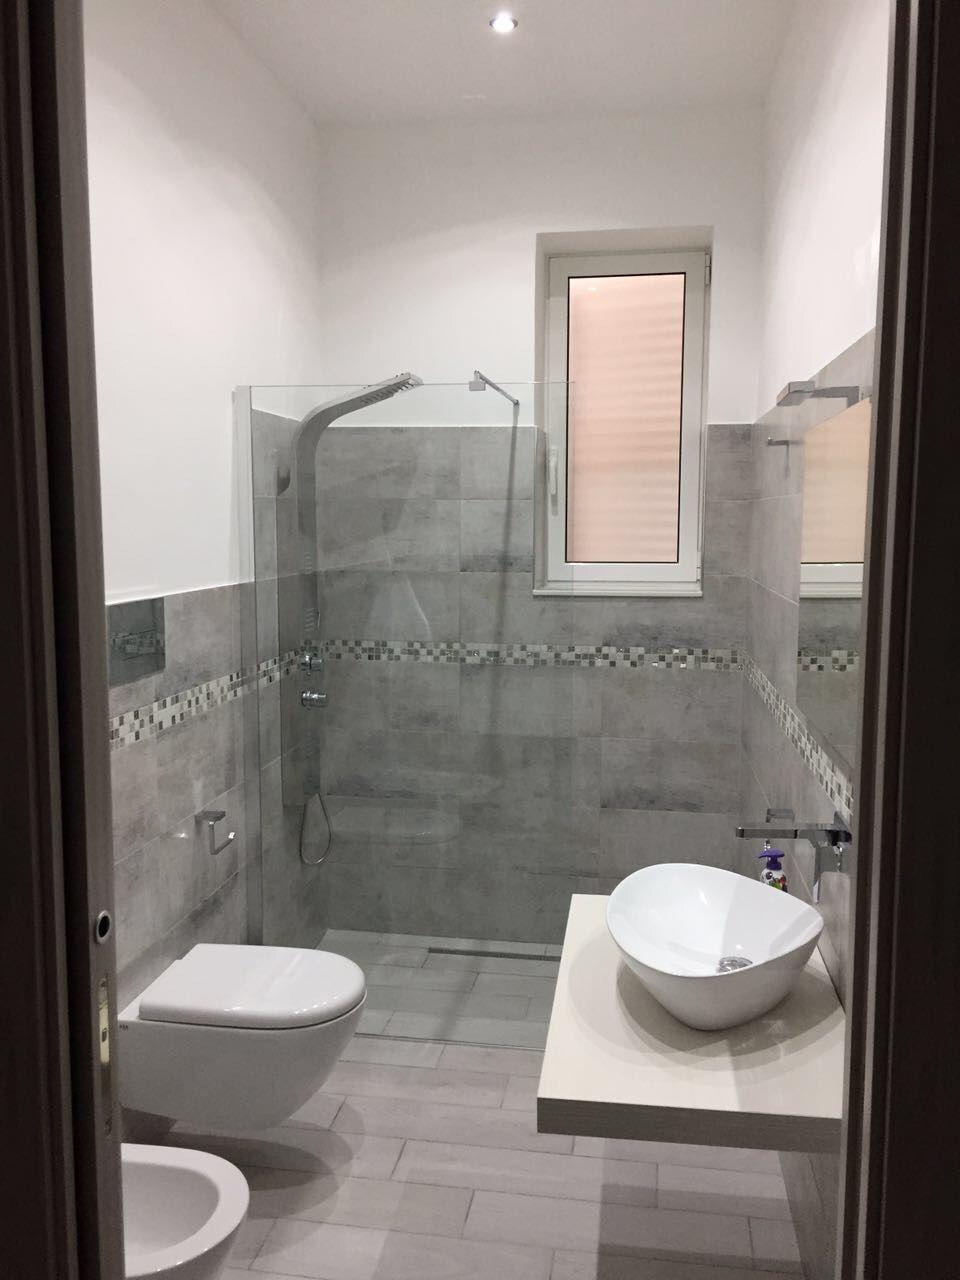 Bagno moderno Grigio bianco mosaico | house | Bathroom, Bathtub, House